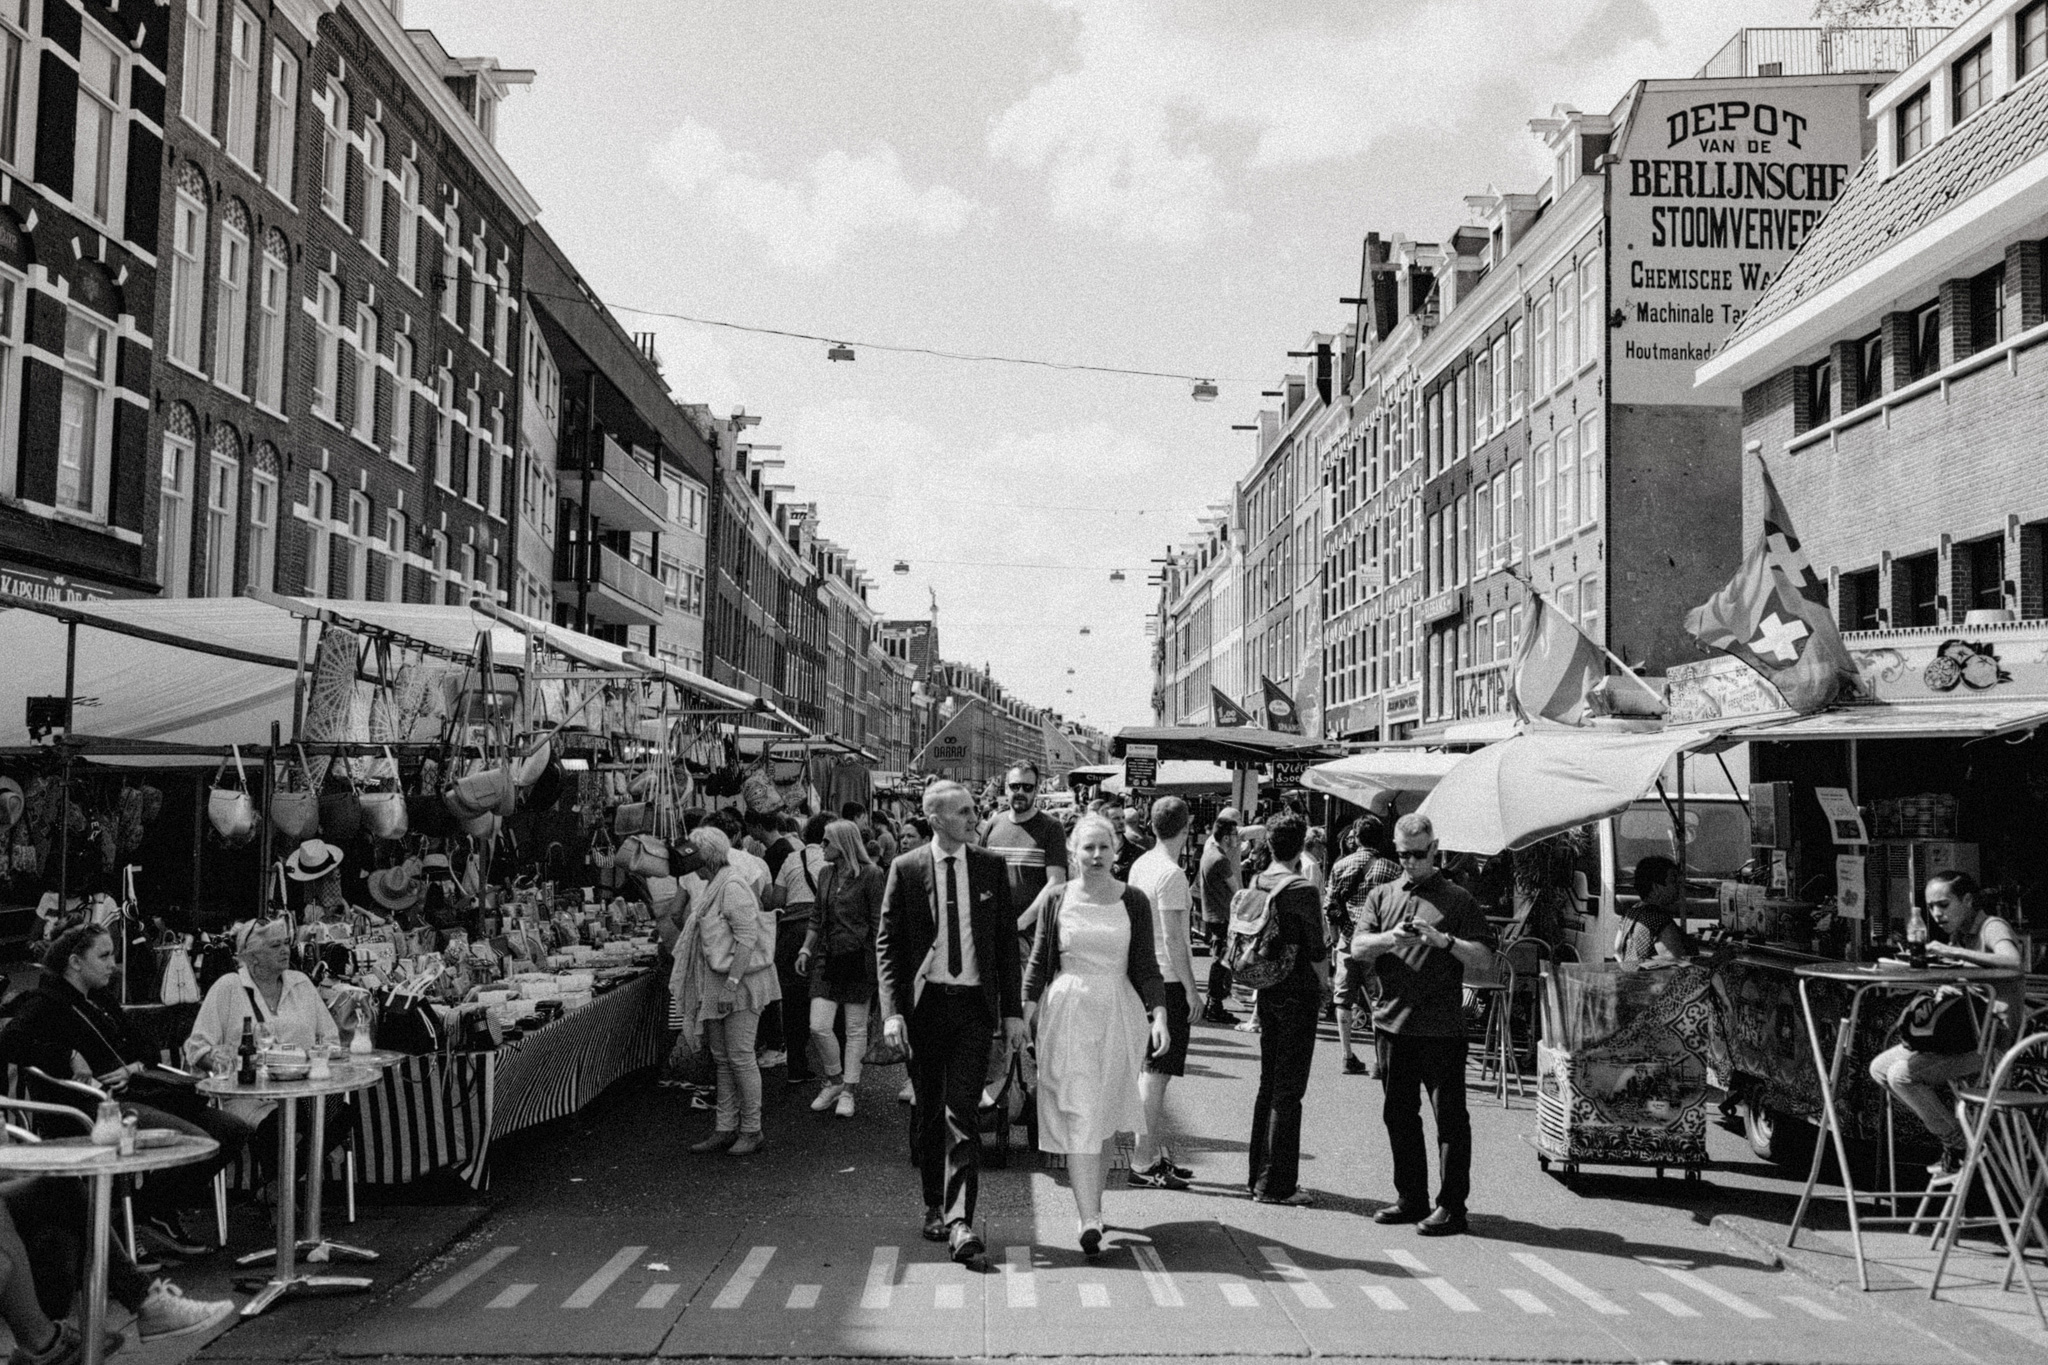 Elopement couple walking hand in hand at Albert Cuyp Market in Amsterdam